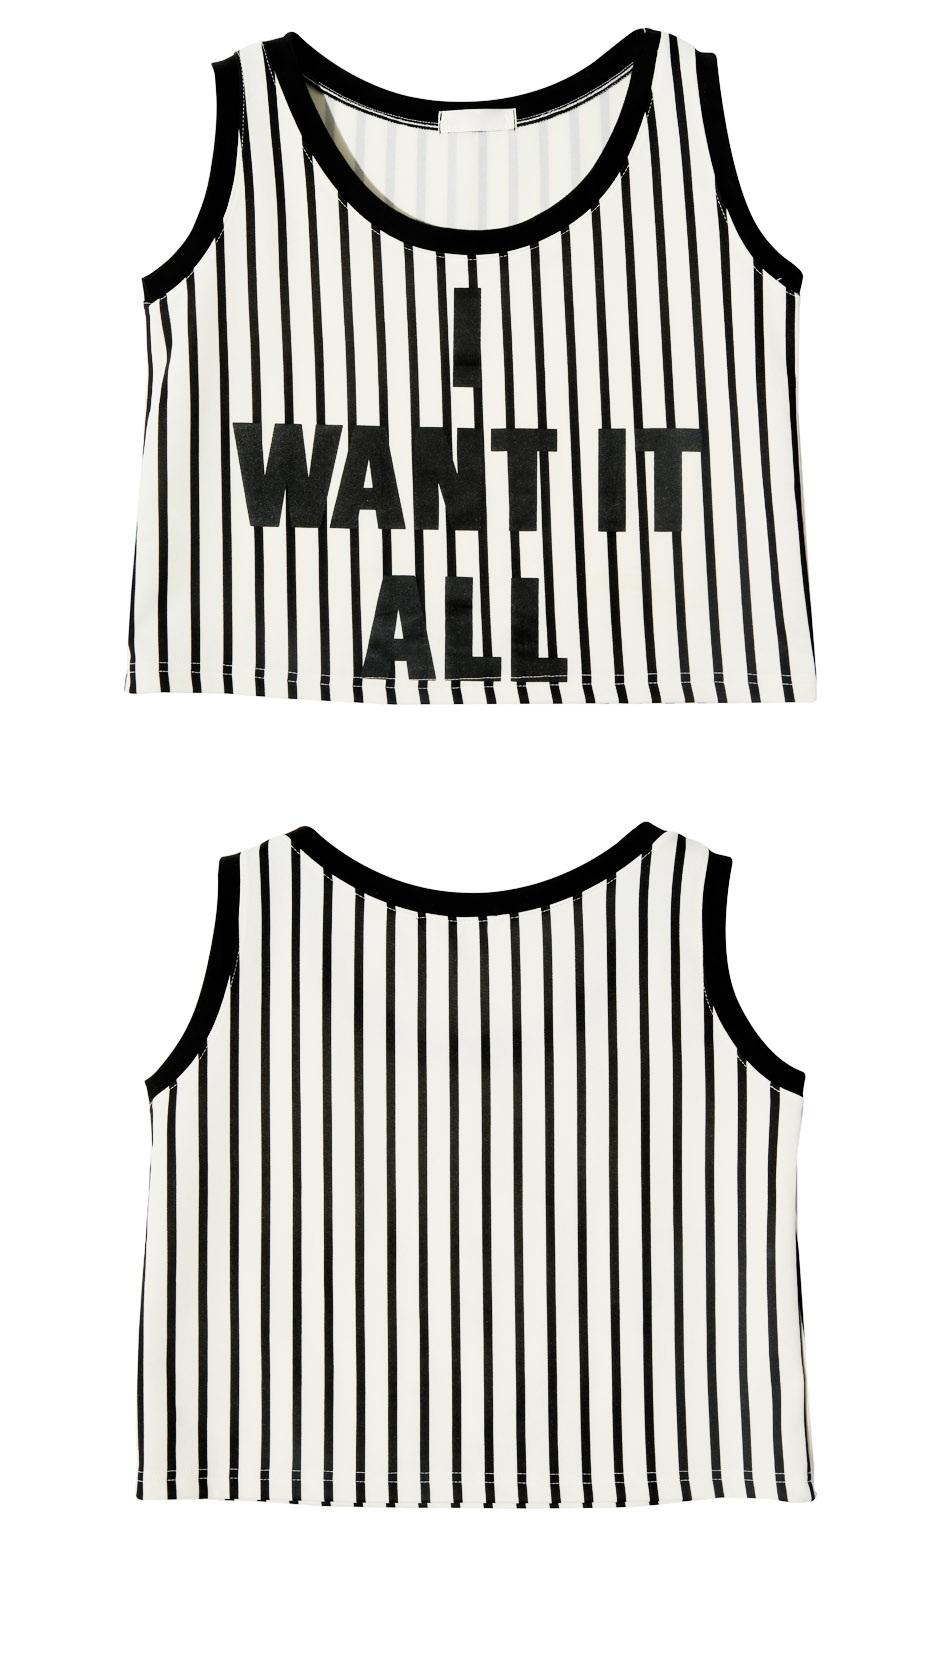 stylenanda-snbx00886296-时尚英文字母竖条纹背心